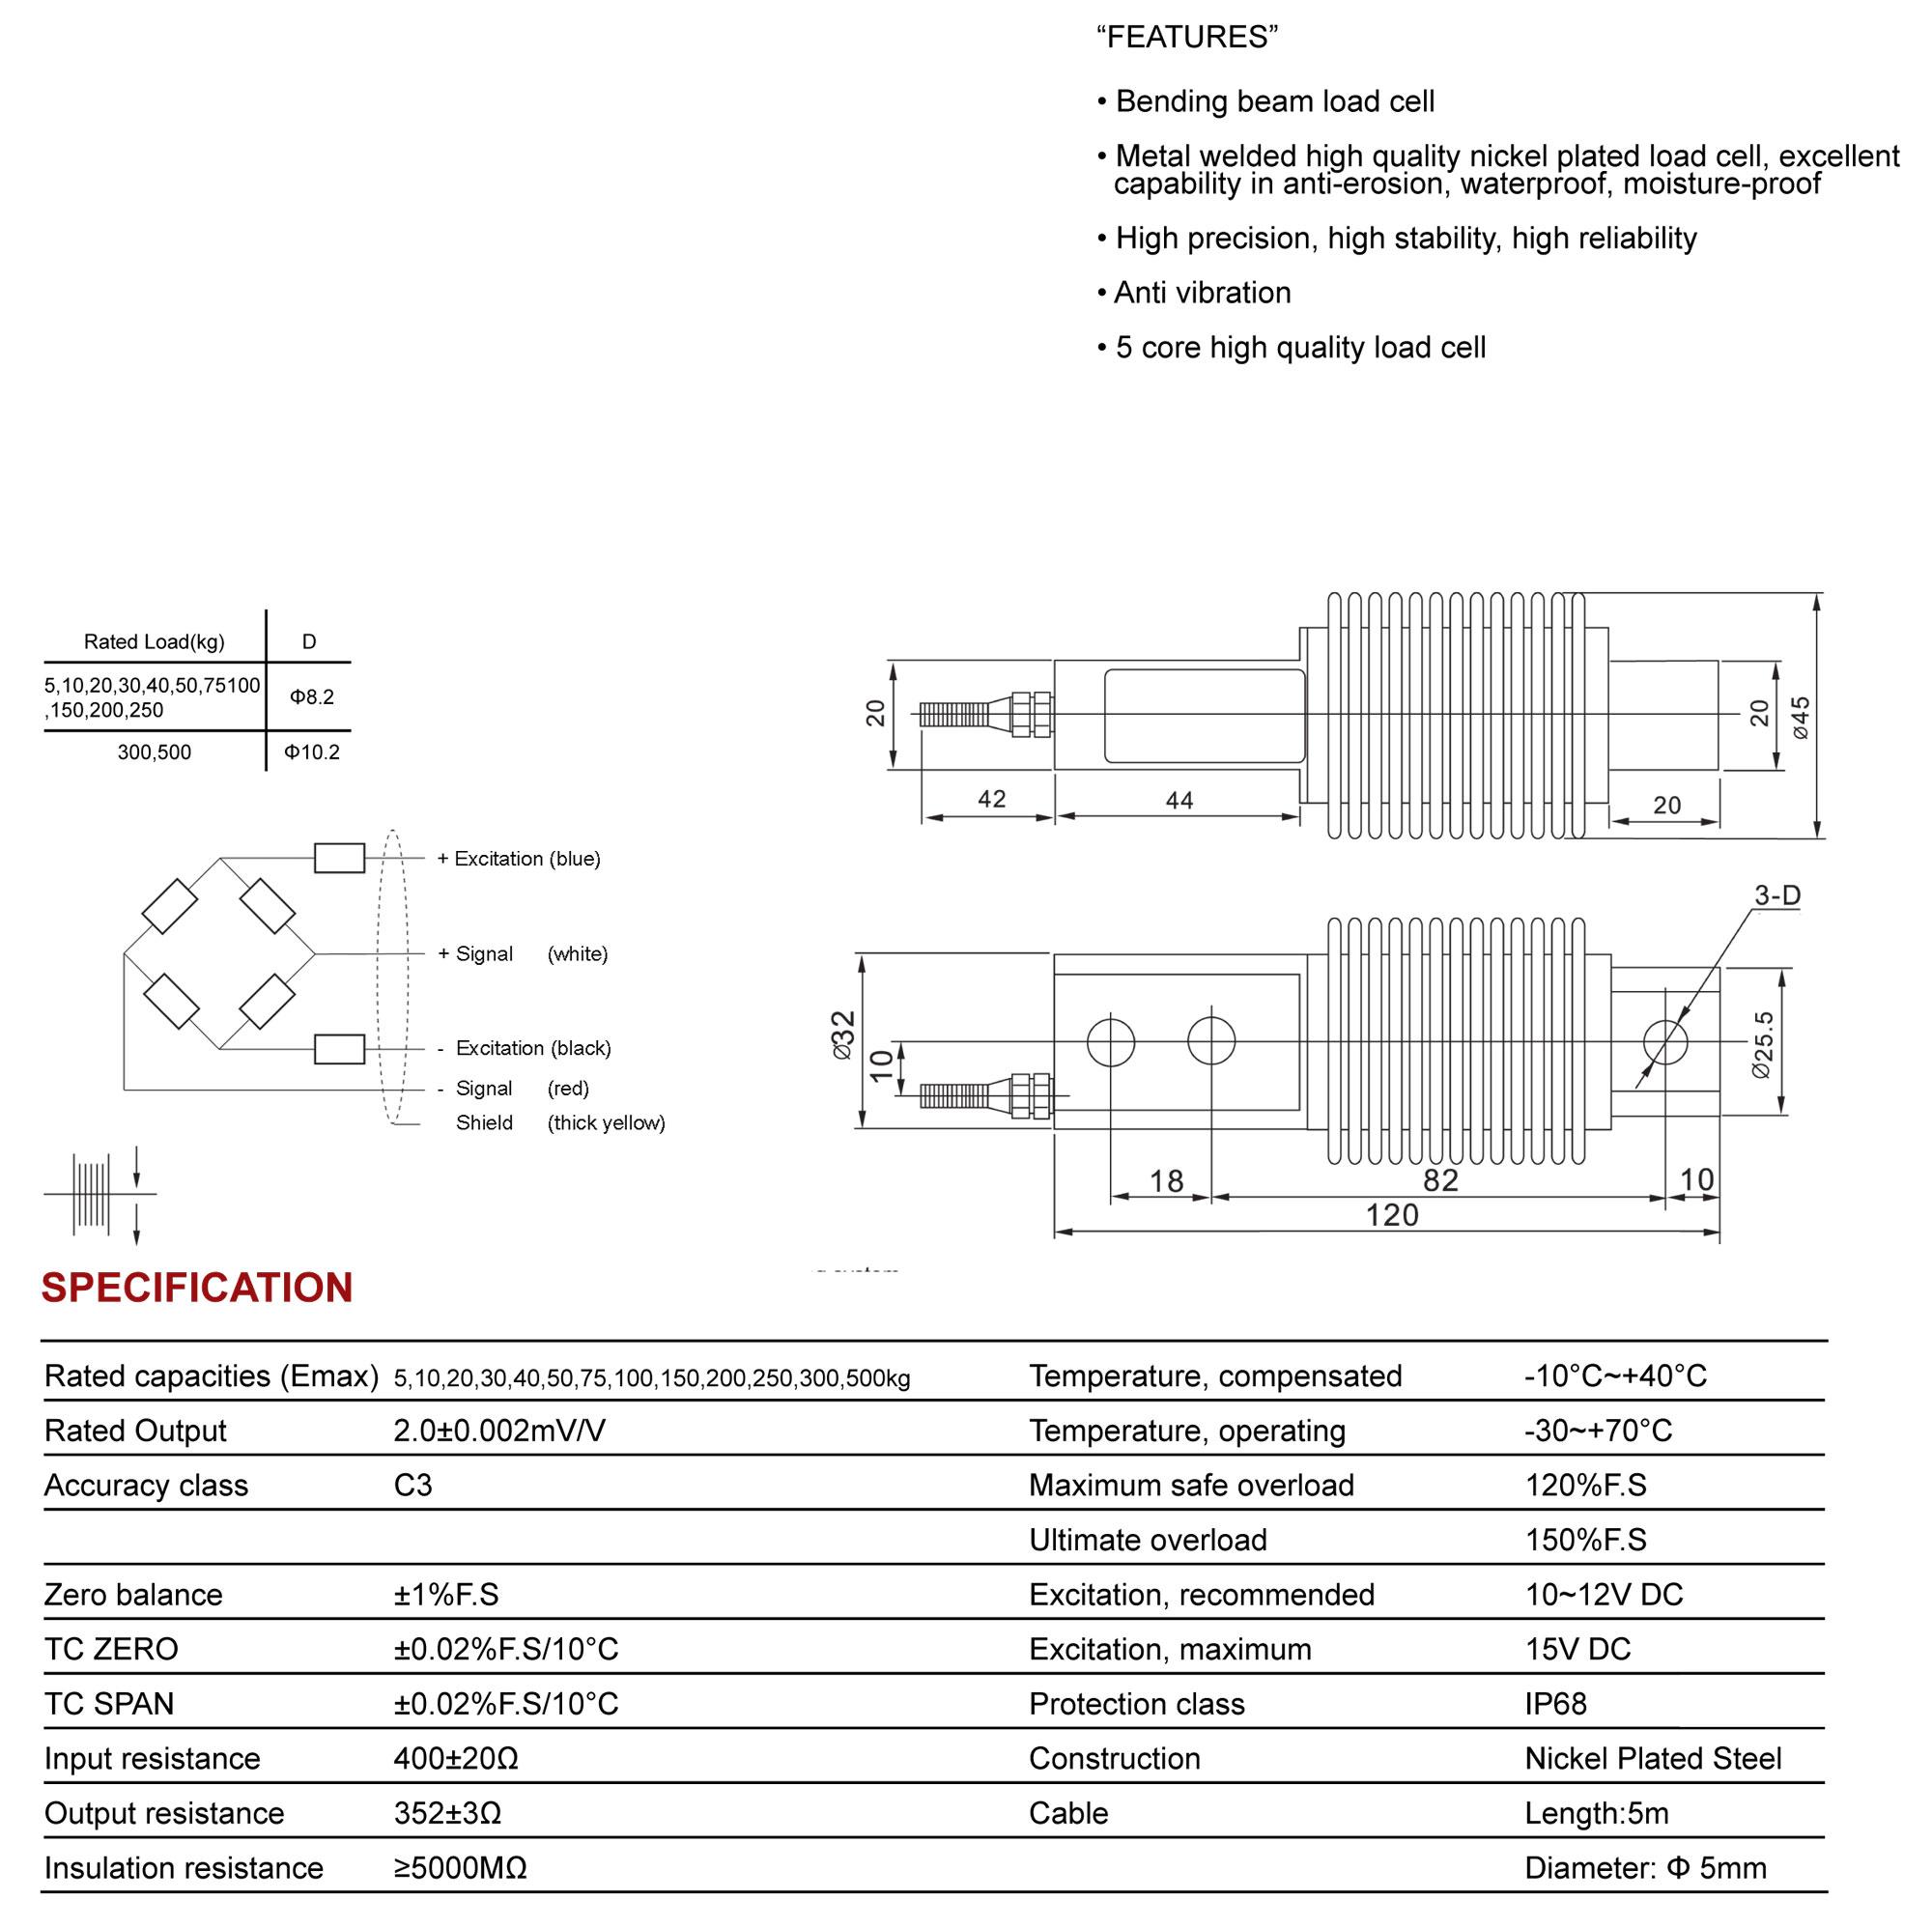 spec-MK-Z6